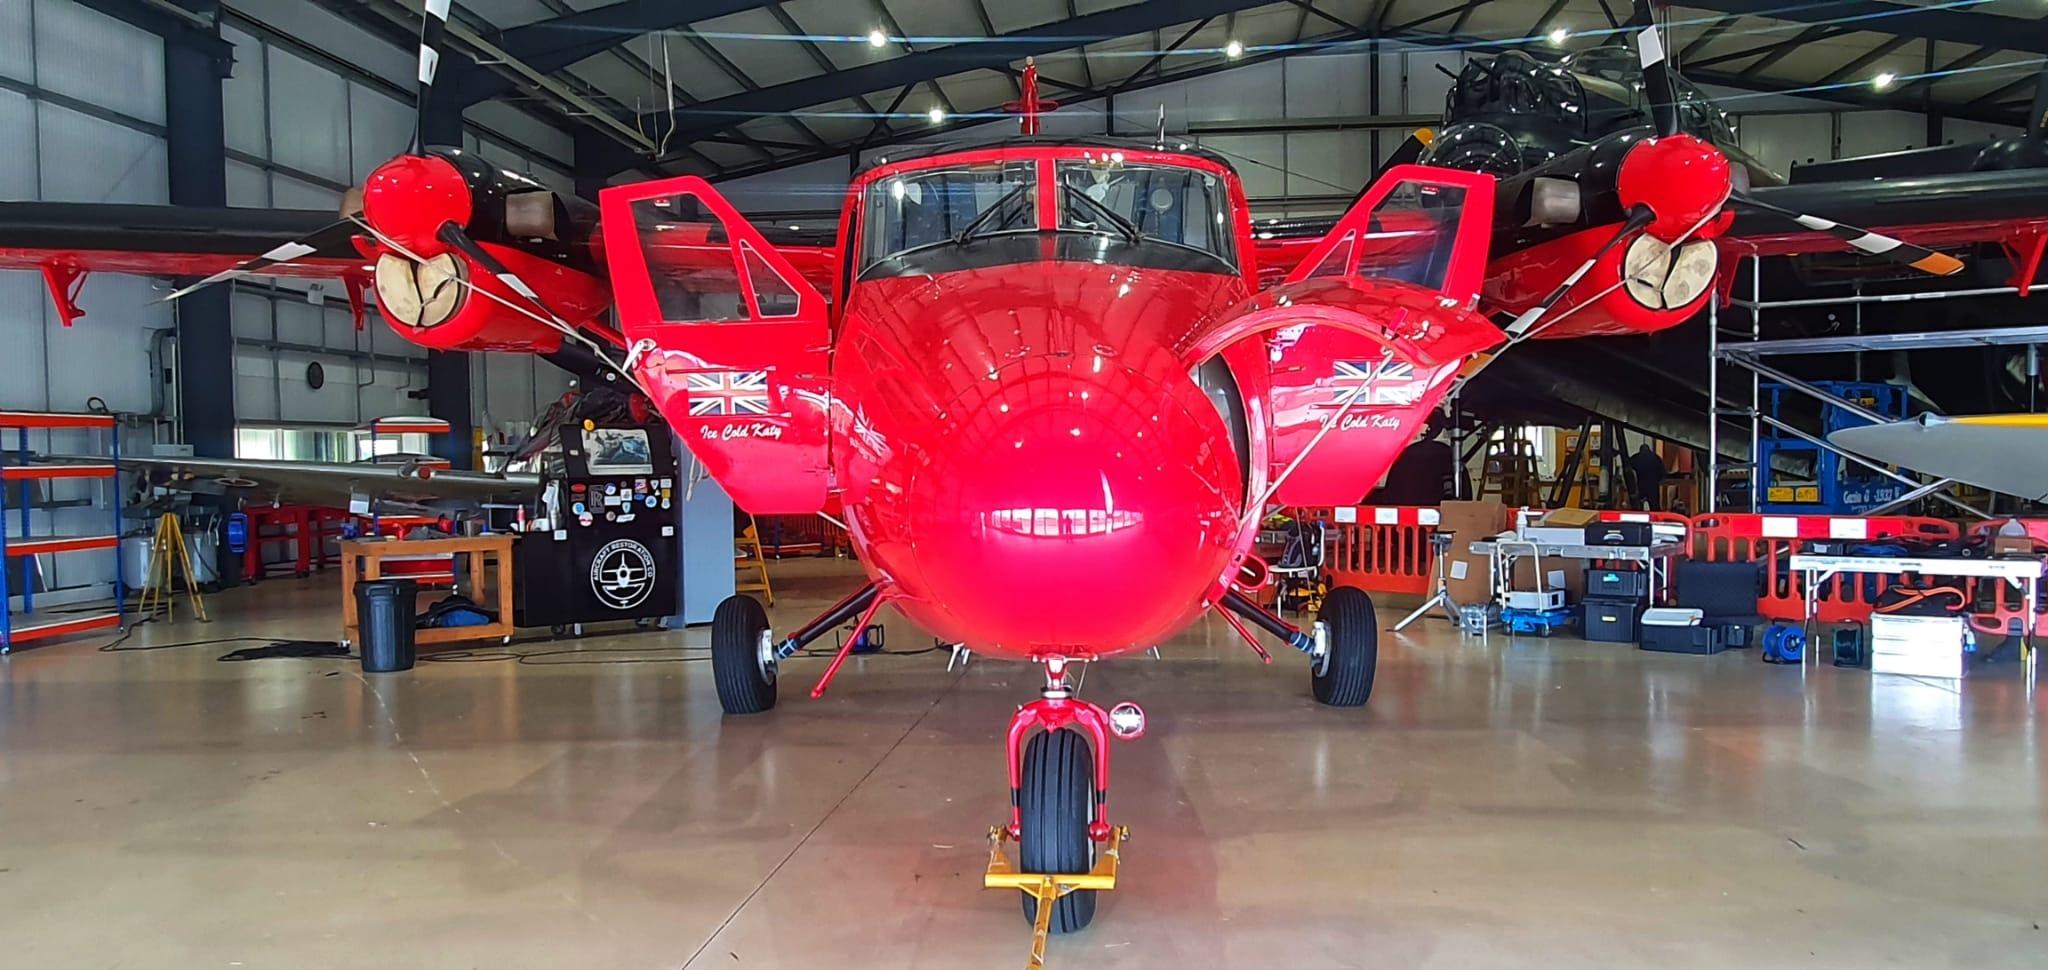 British Antarctic Survey Twin Otter Plane,